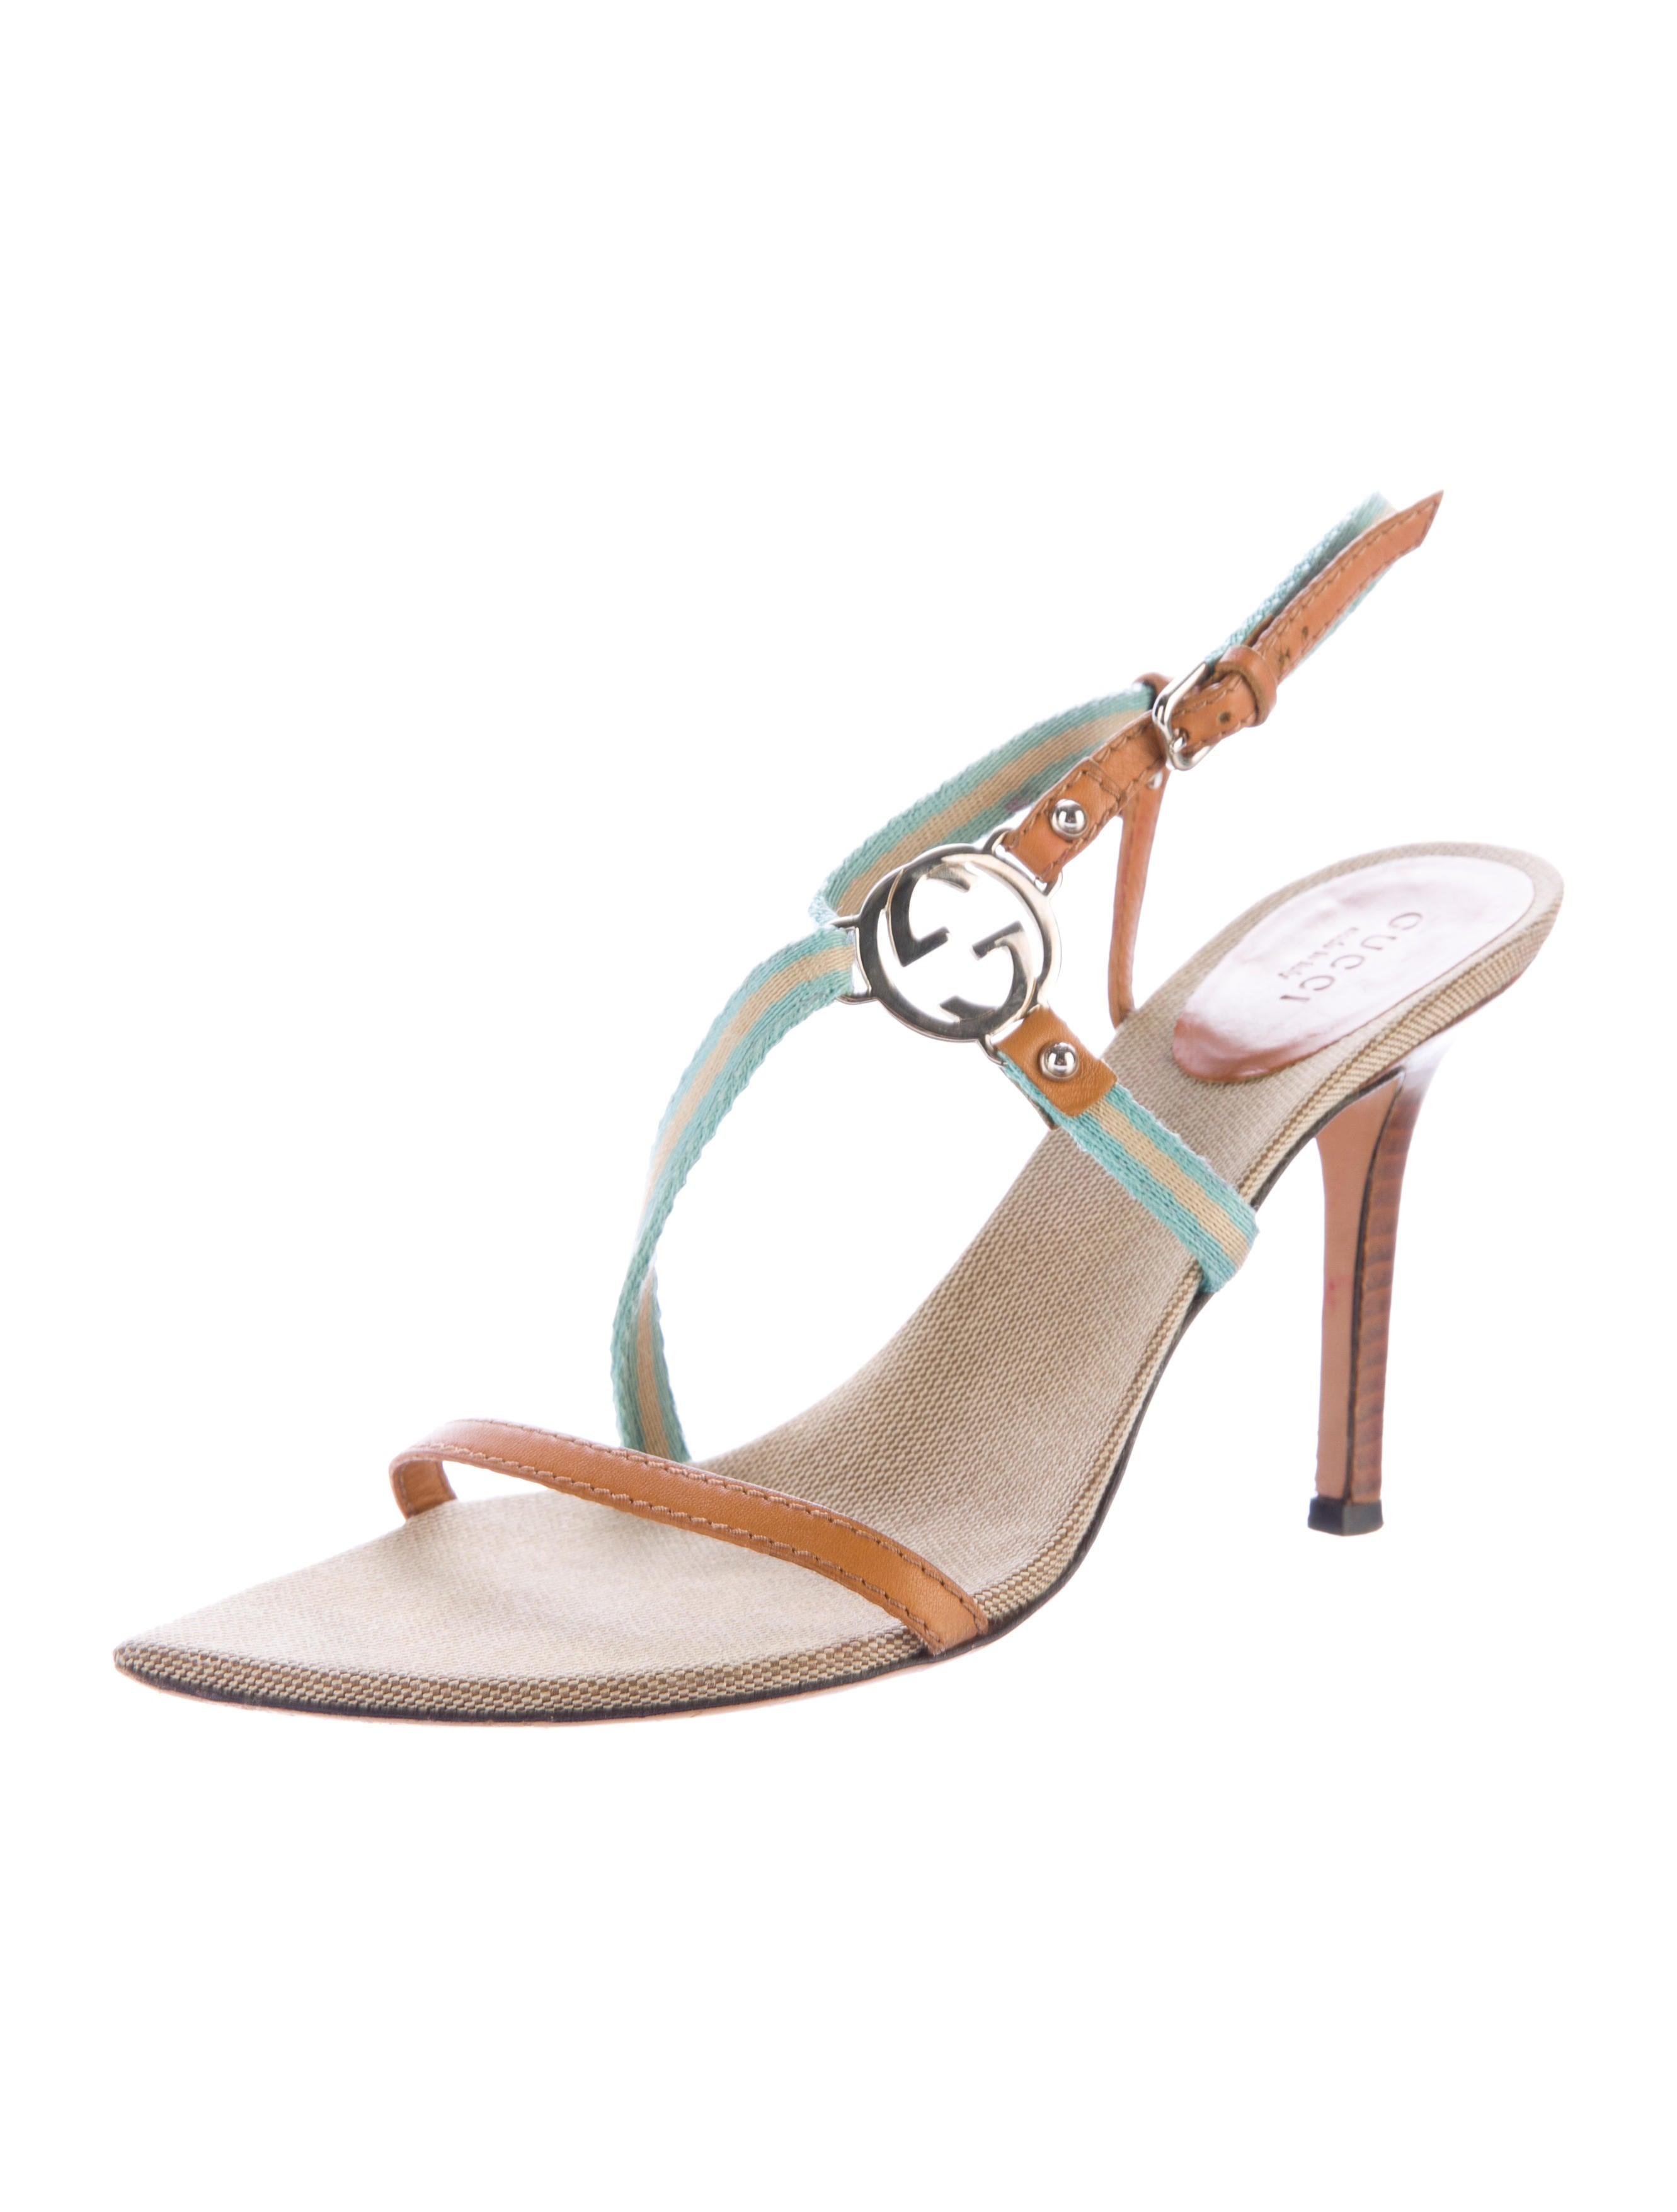 a6e985a4f5457 Gucci Leather Web-Trimmed Sandals - Shoes - GUC144282